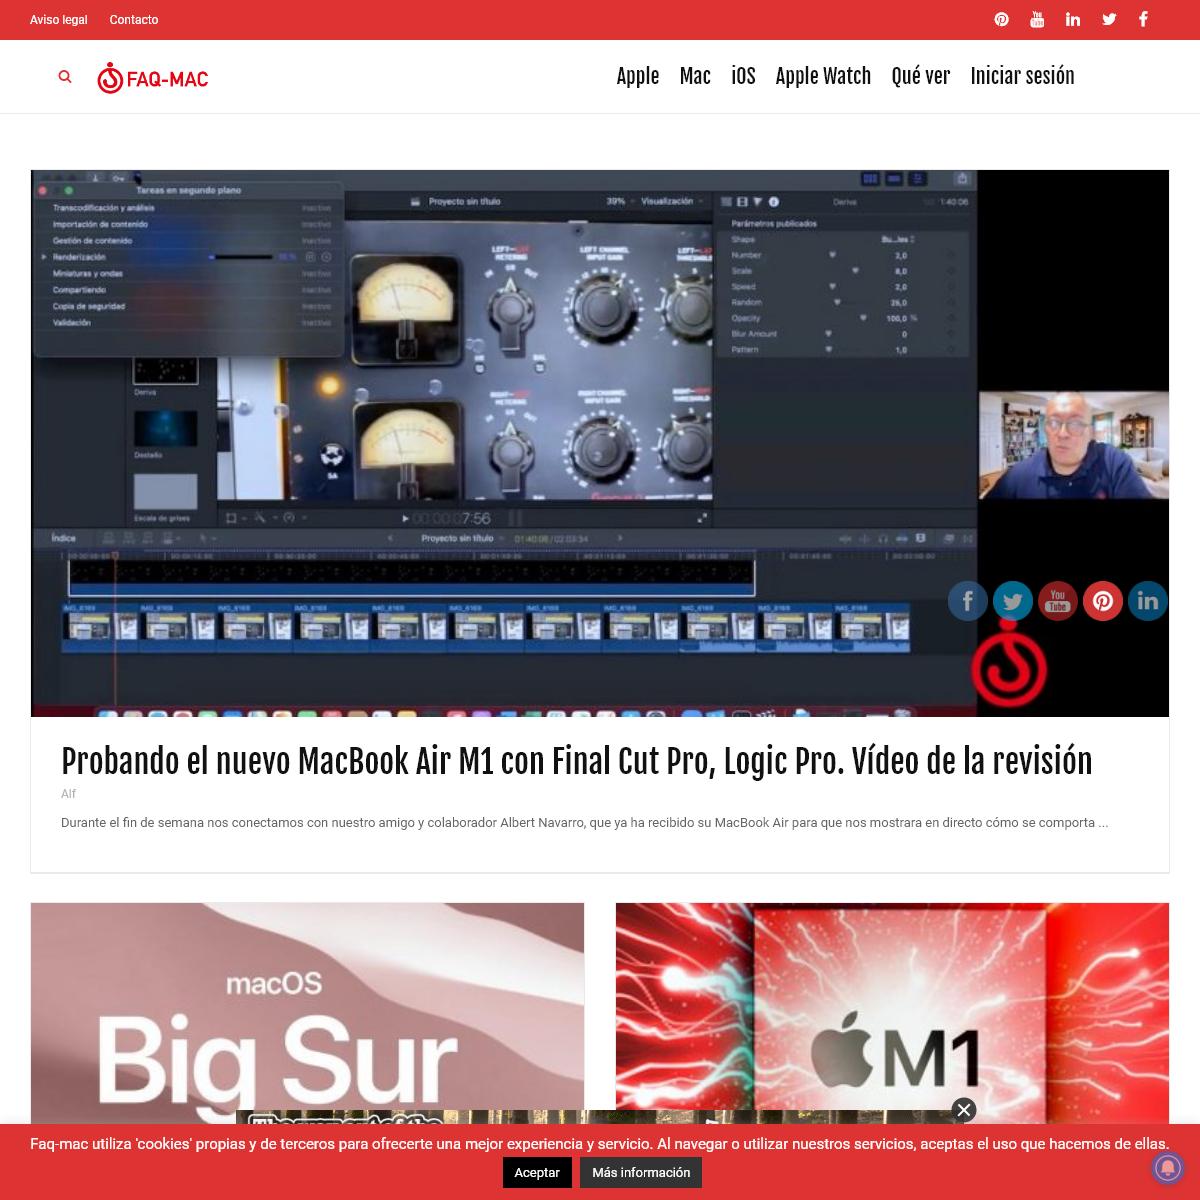 Faq-mac – Apple, Mac, iPhone, iPad, Apple Watch. Tutoriales, Soporte, Noticias, Revisiones